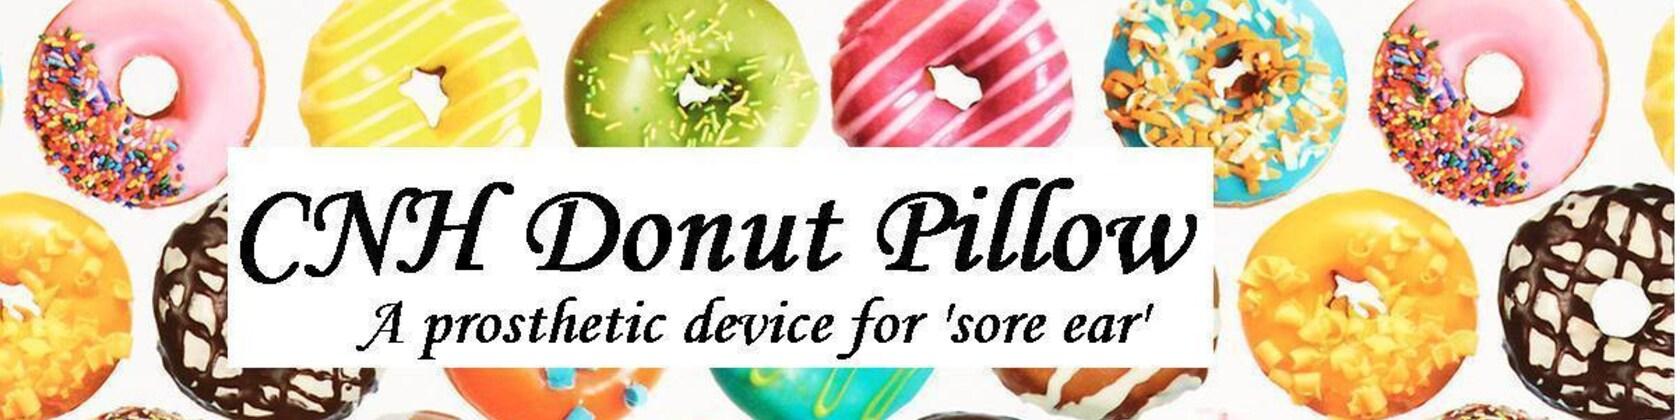 cnh ear donut pillow by CNHdonut on Etsy